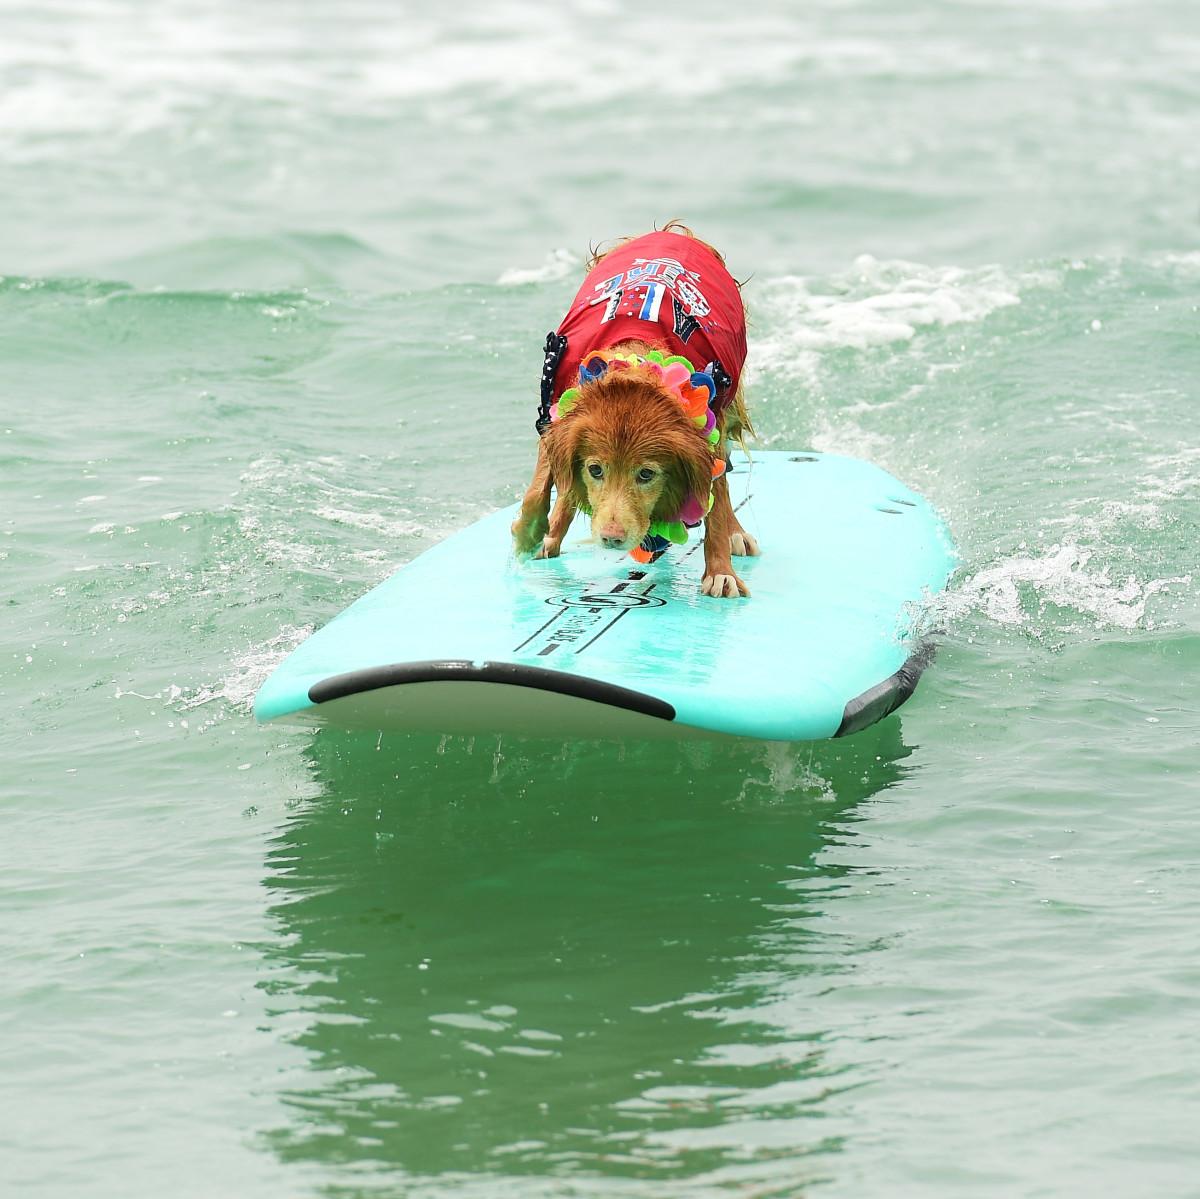 Surfing_Dog_Gallery_002.jpg